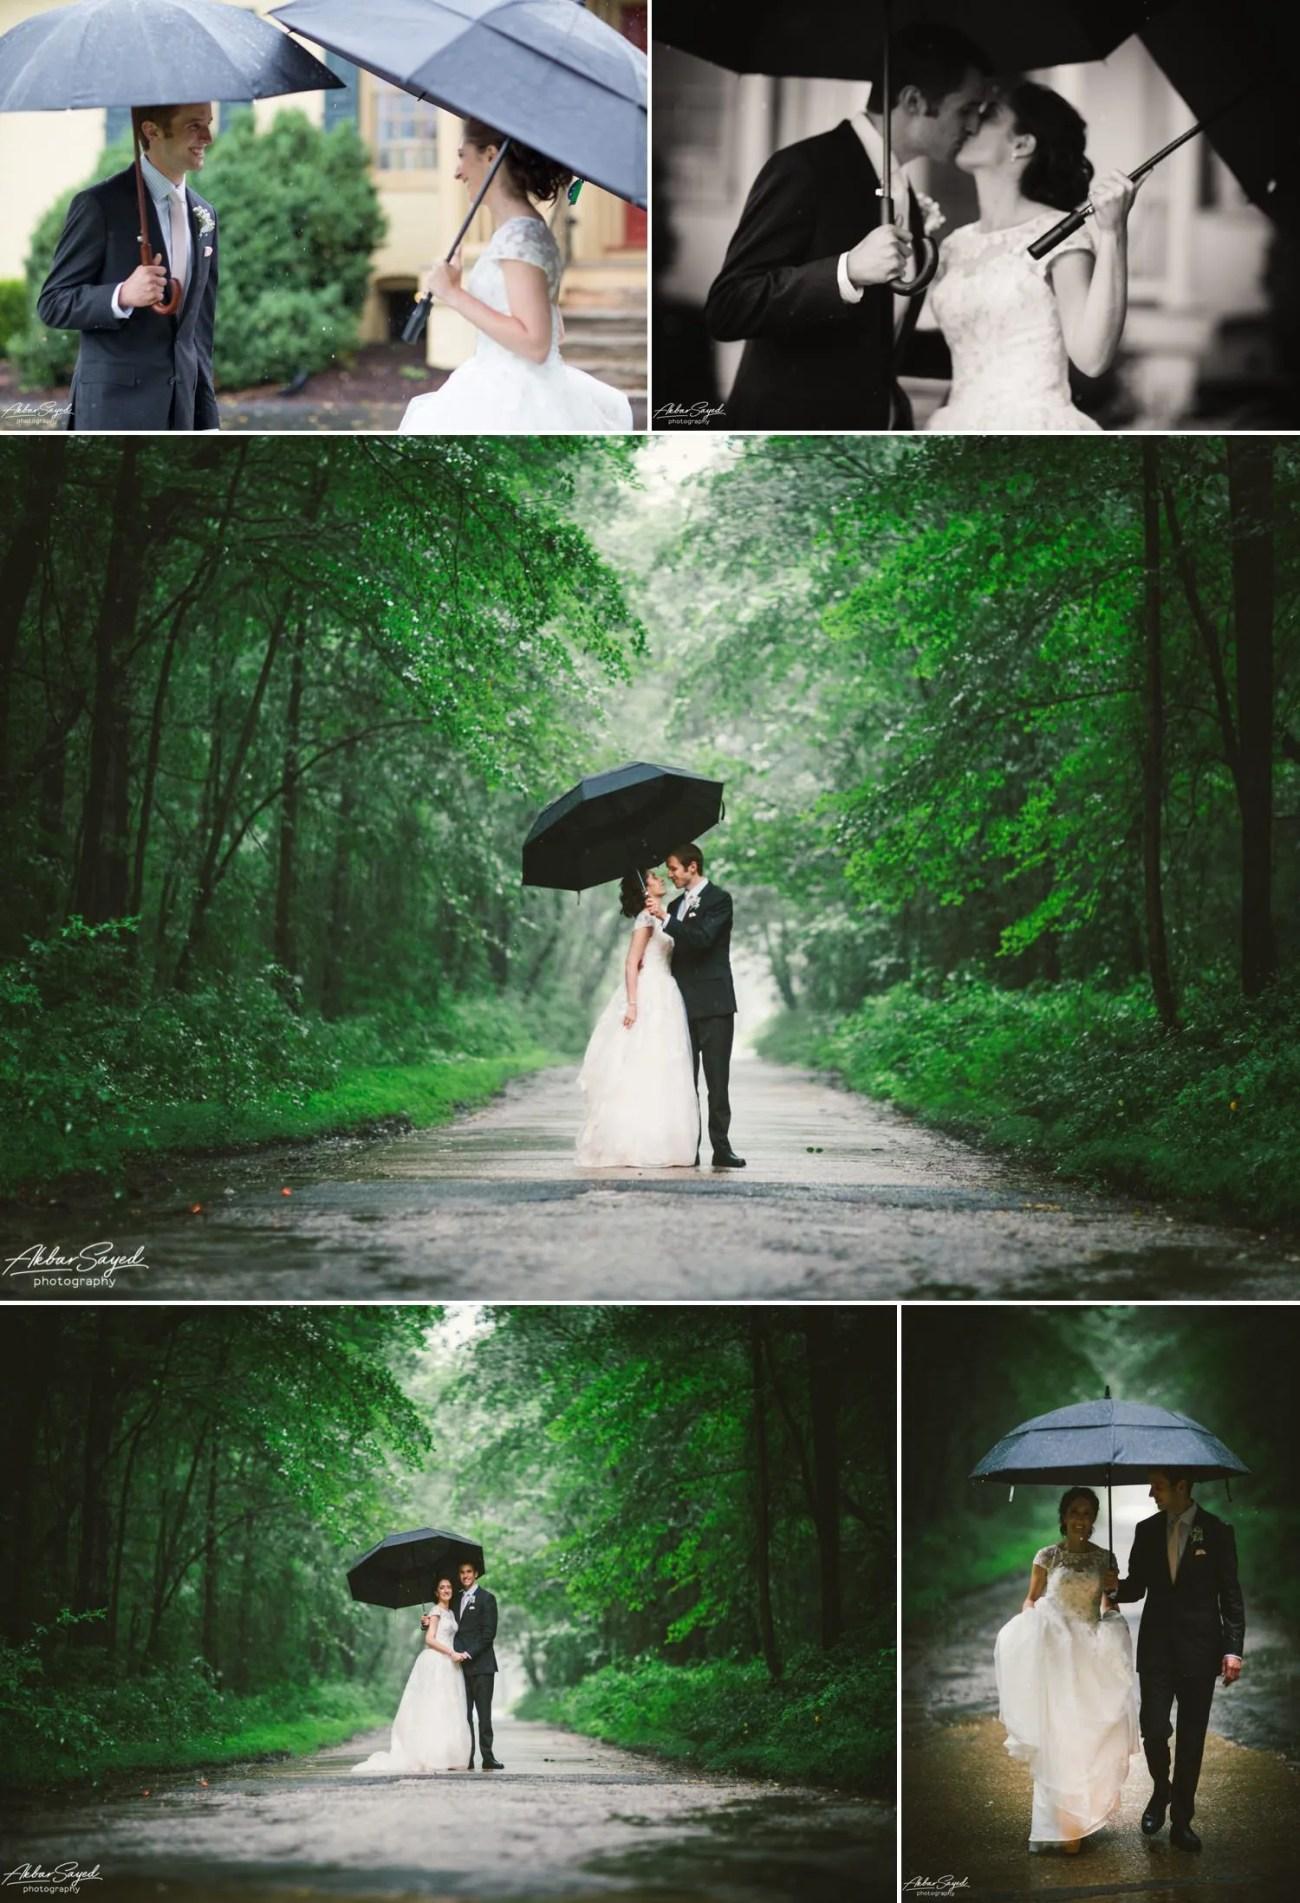 Erica and Jeff - Belmont Manor Wedding 8